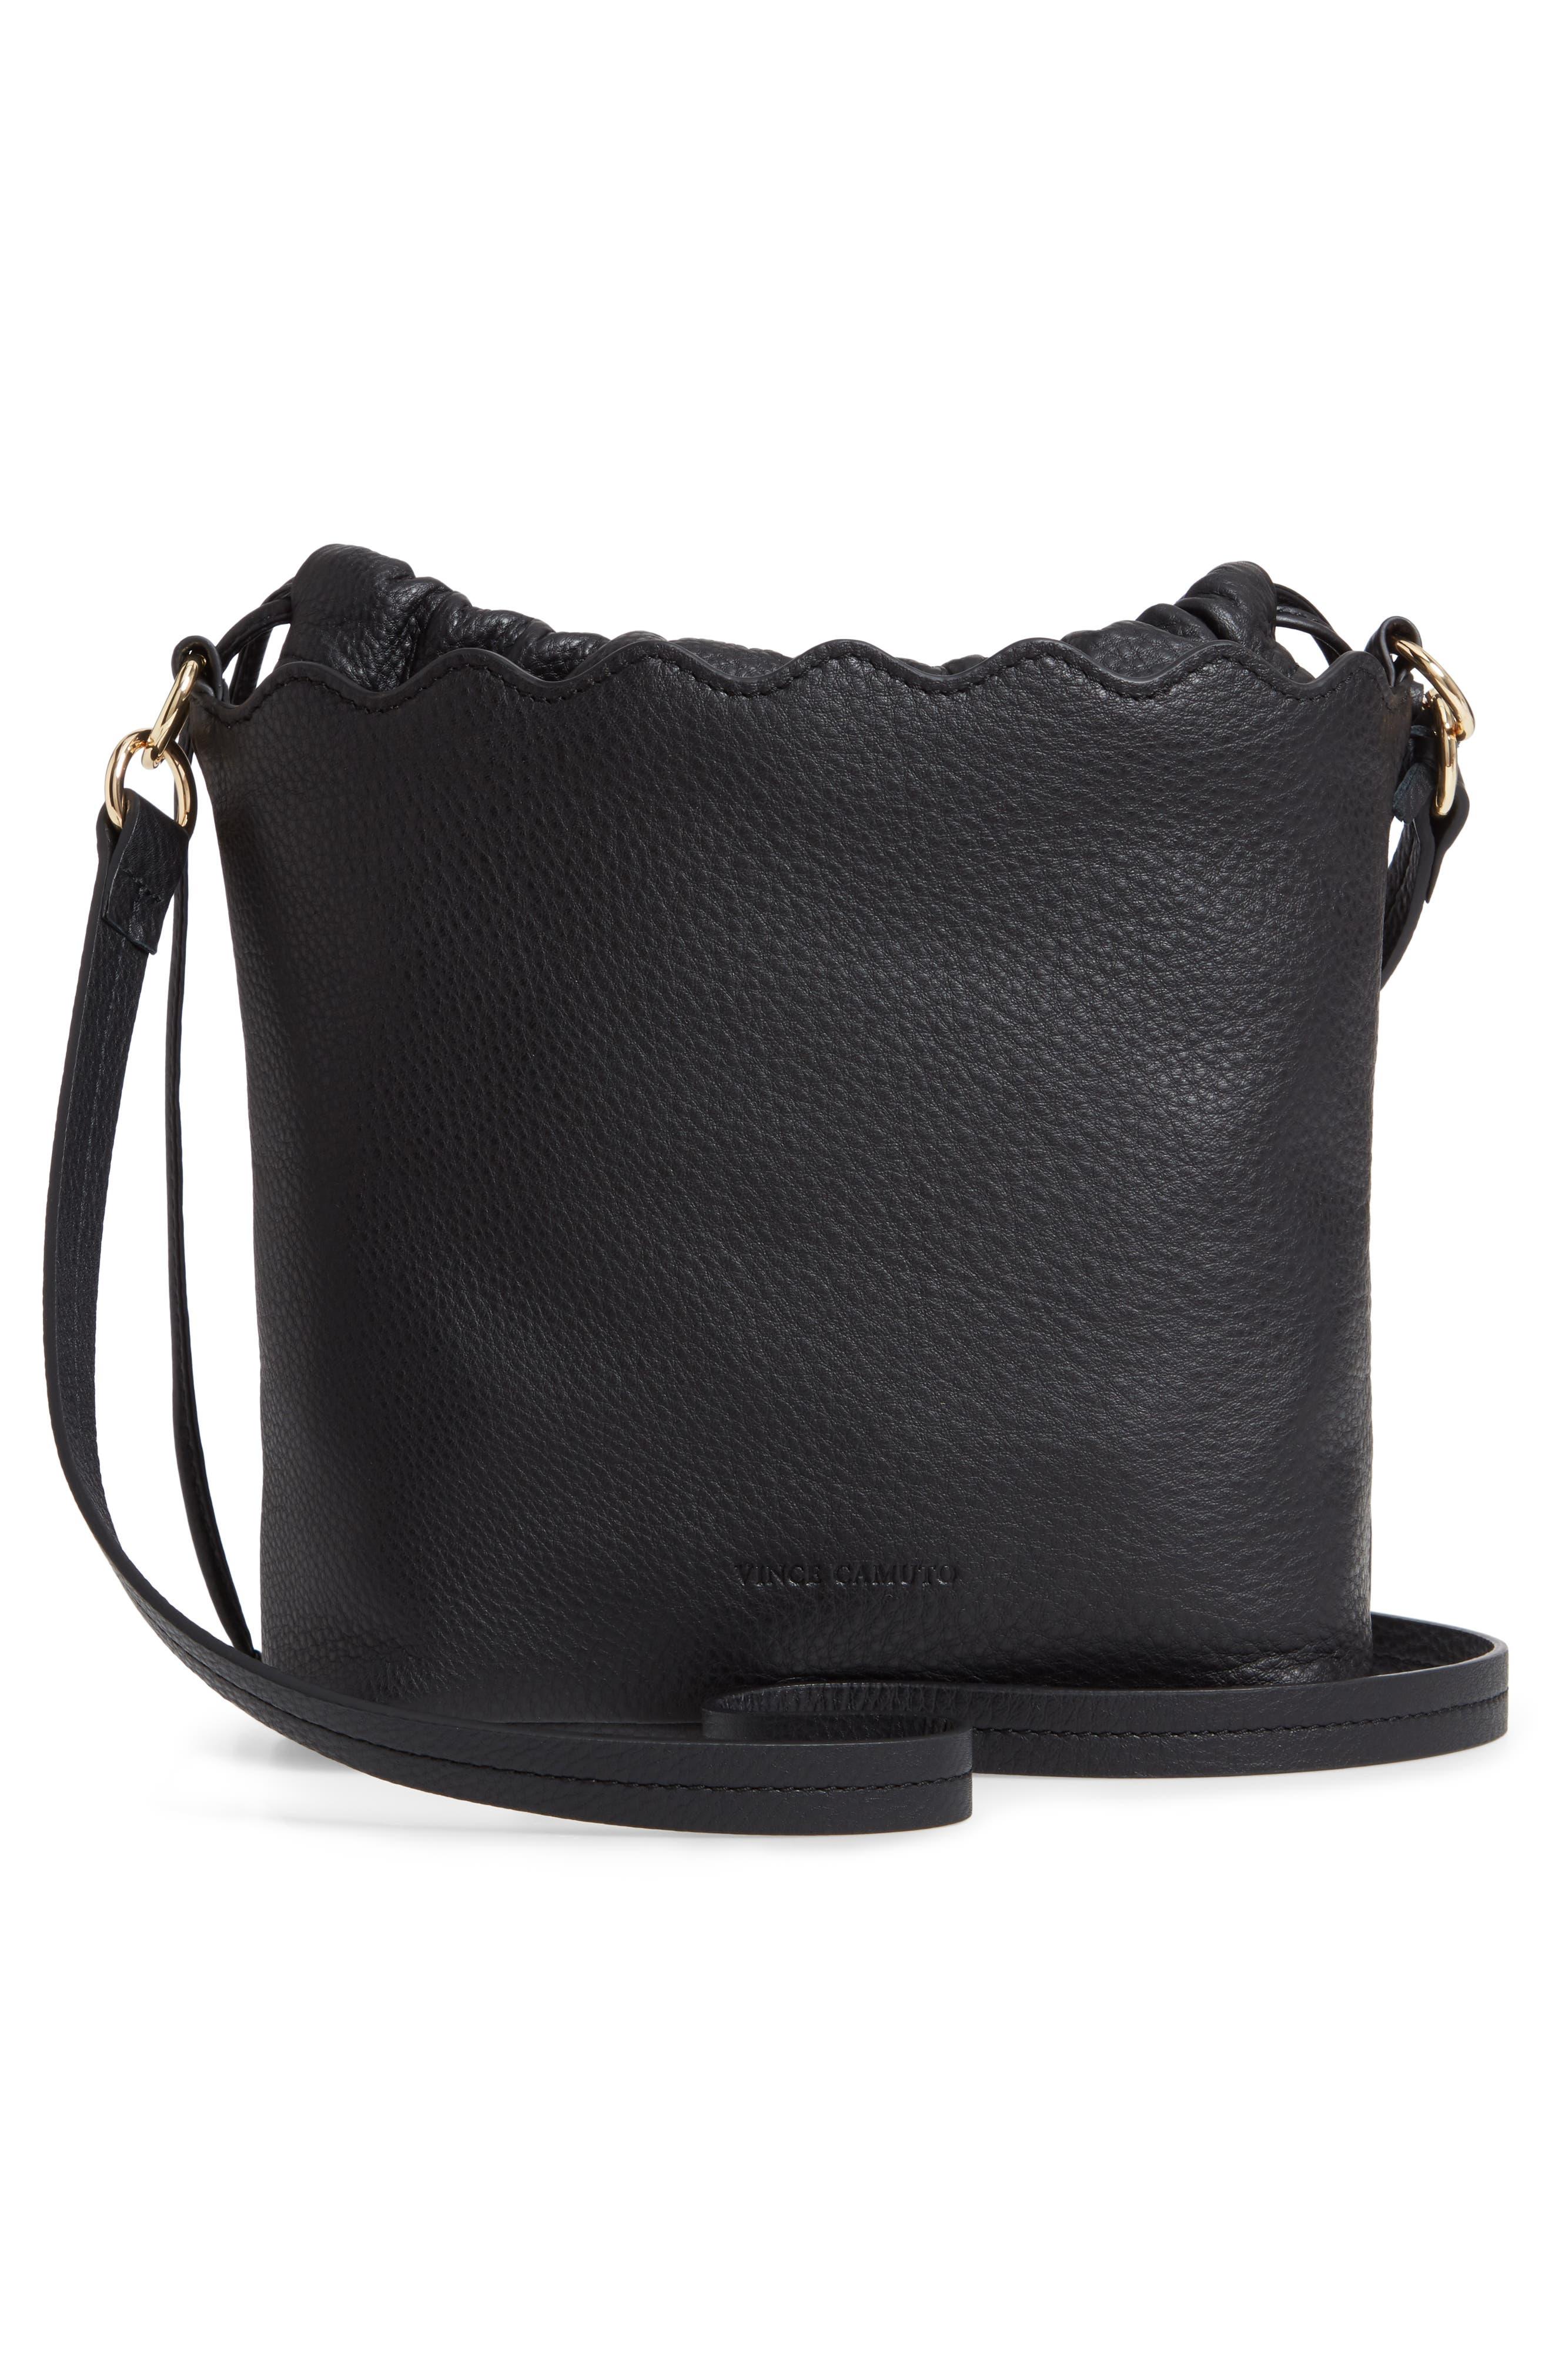 VINCE CAMUTO, Wavy Leather Bucket Bag, Alternate thumbnail 4, color, BLACK